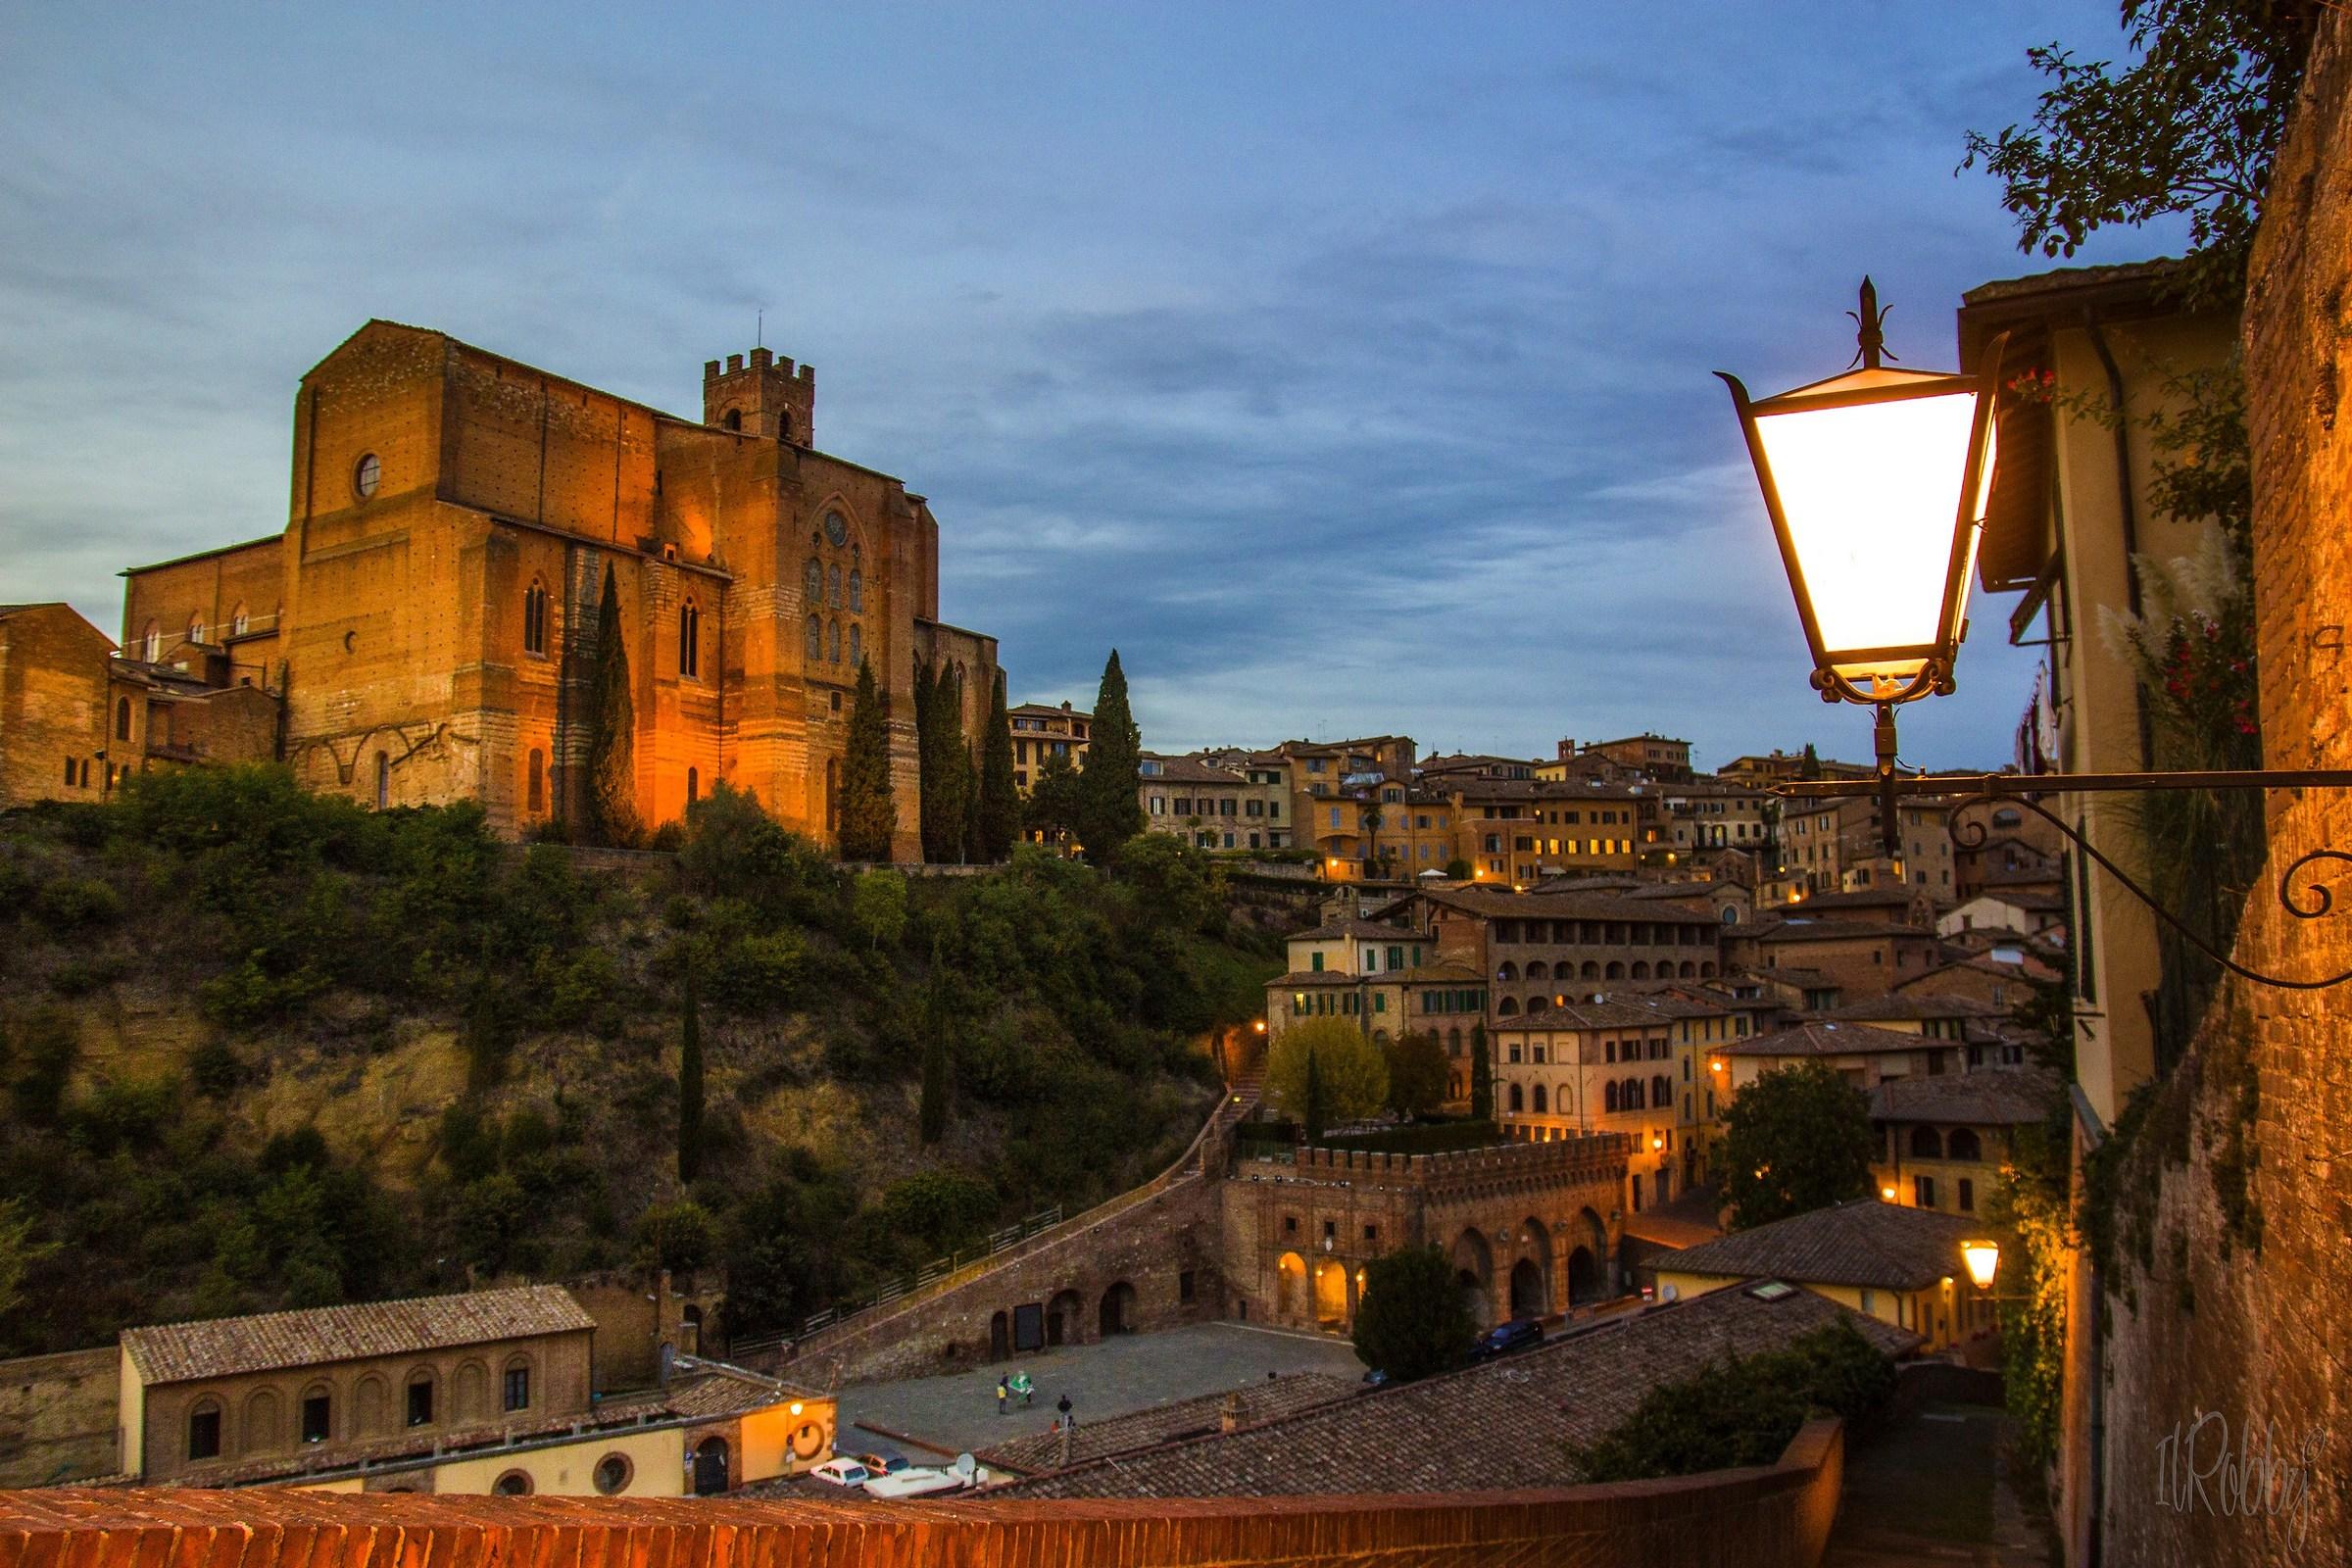 An evening in Siena...